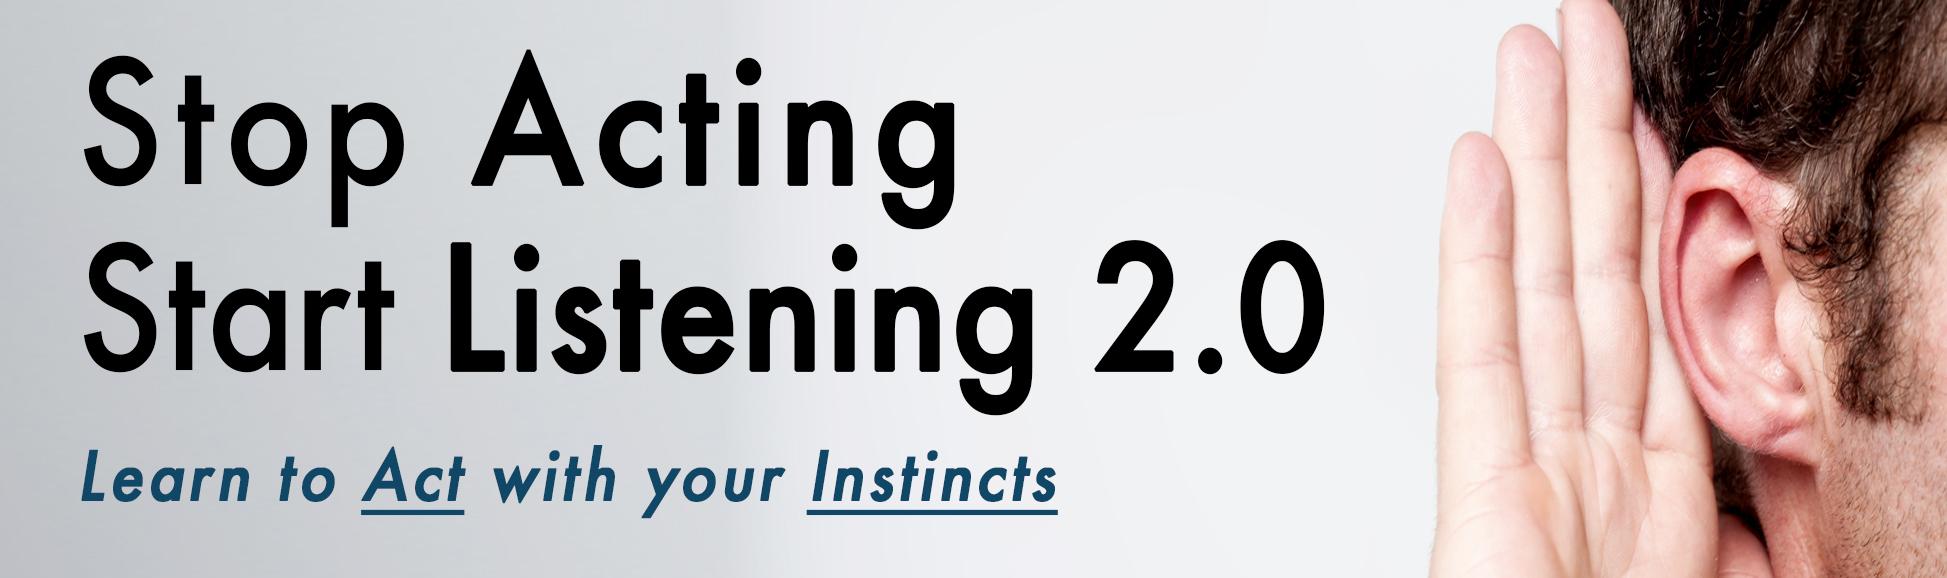 Stop Acting, Start Listening 2.0